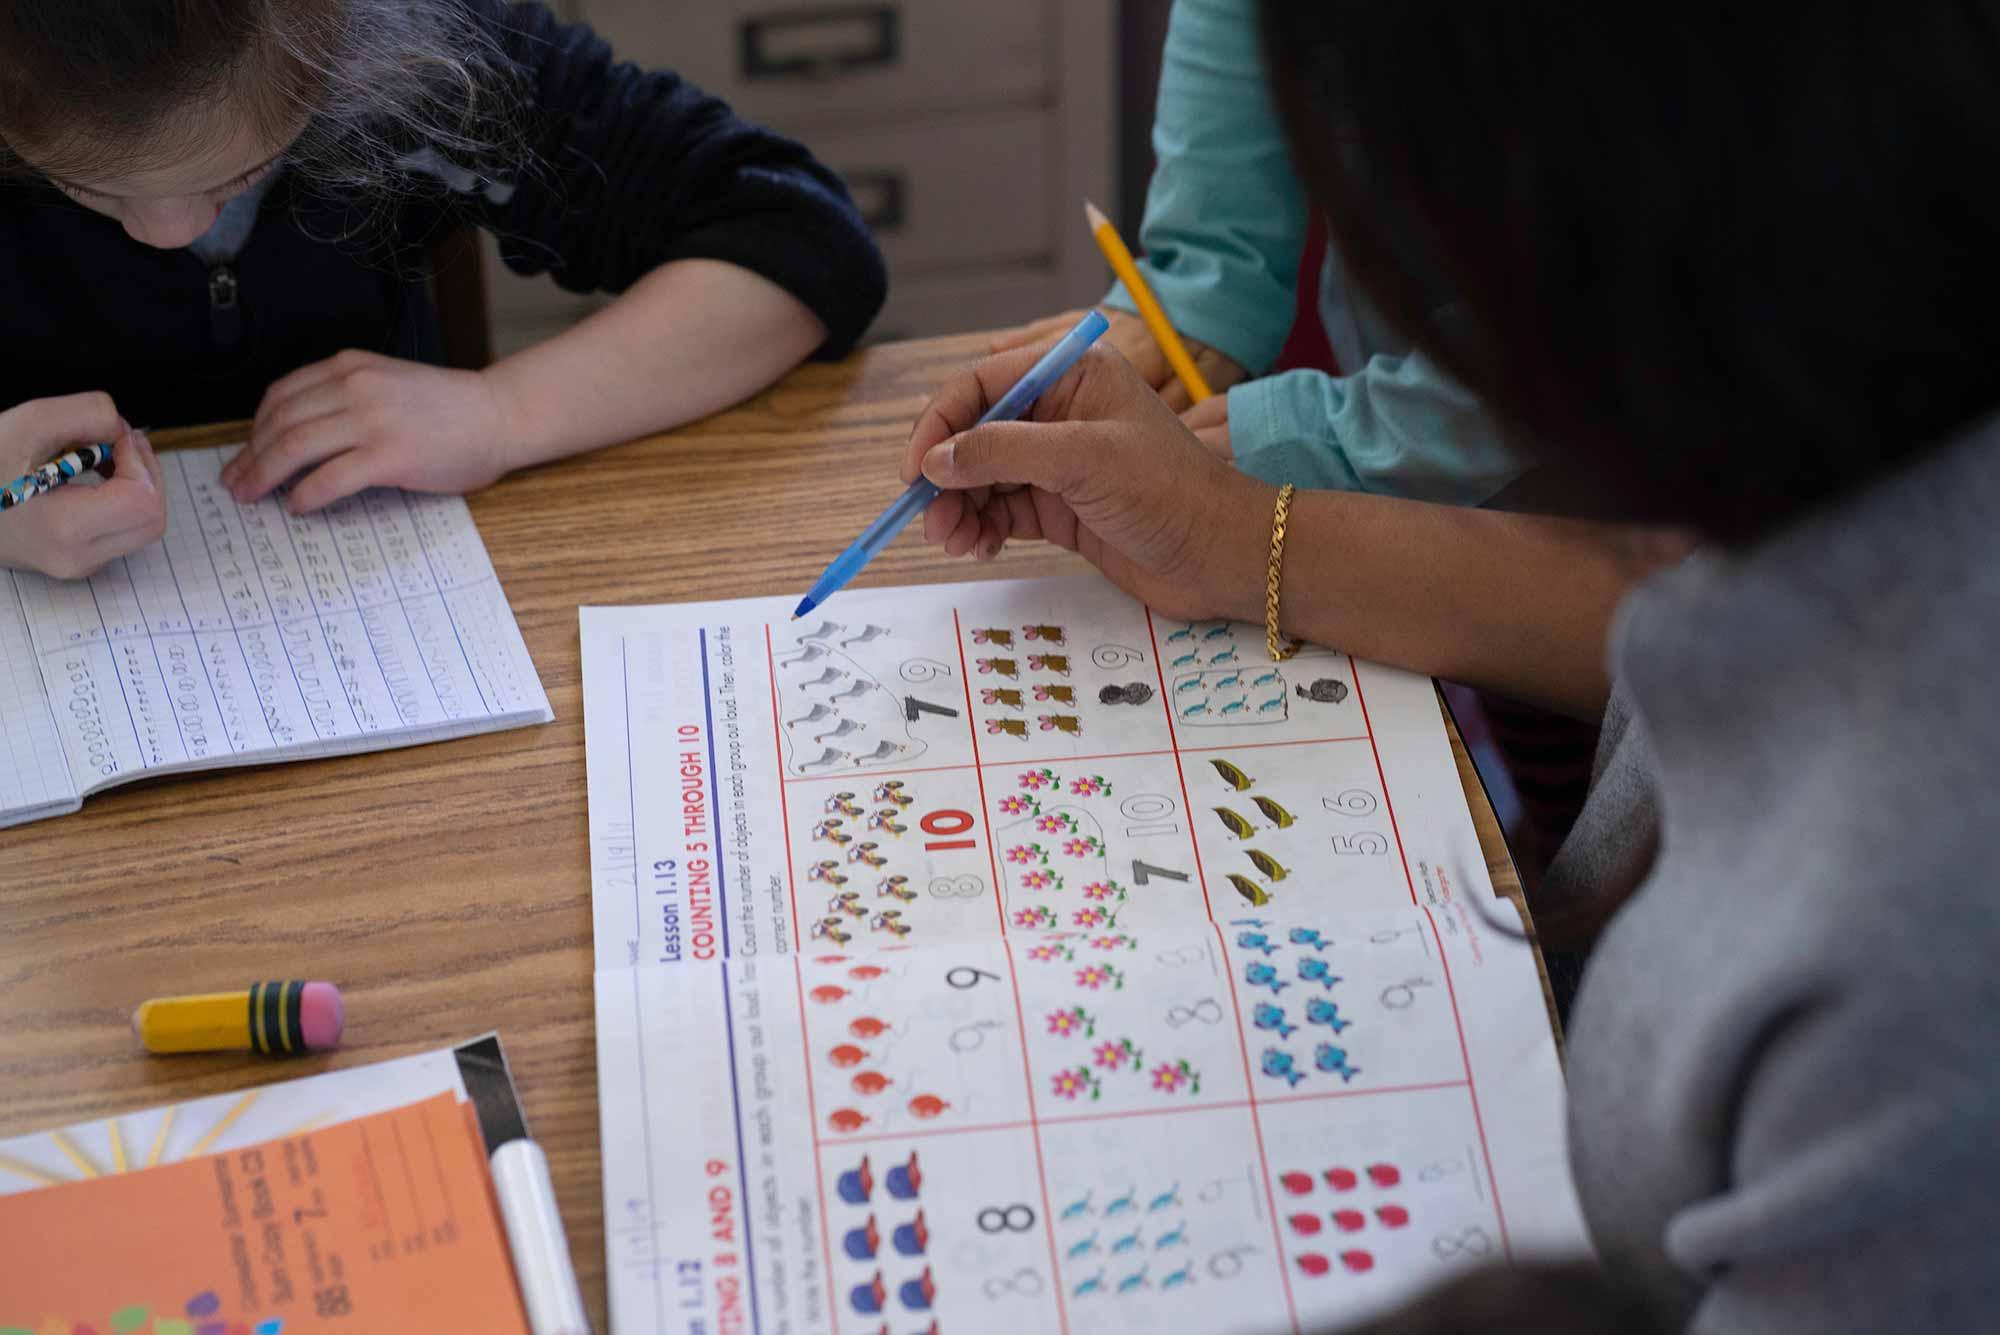 Burbank Montessori Academy Teacher Explains Mathematics